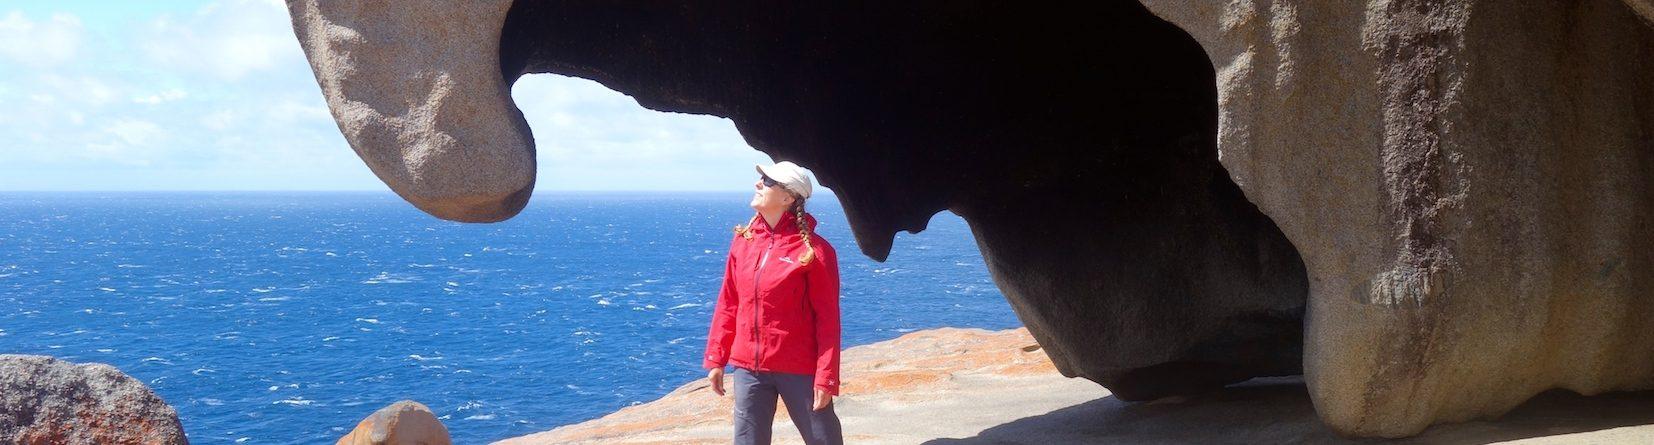 The new Kangaroo Island Wilderness Trail